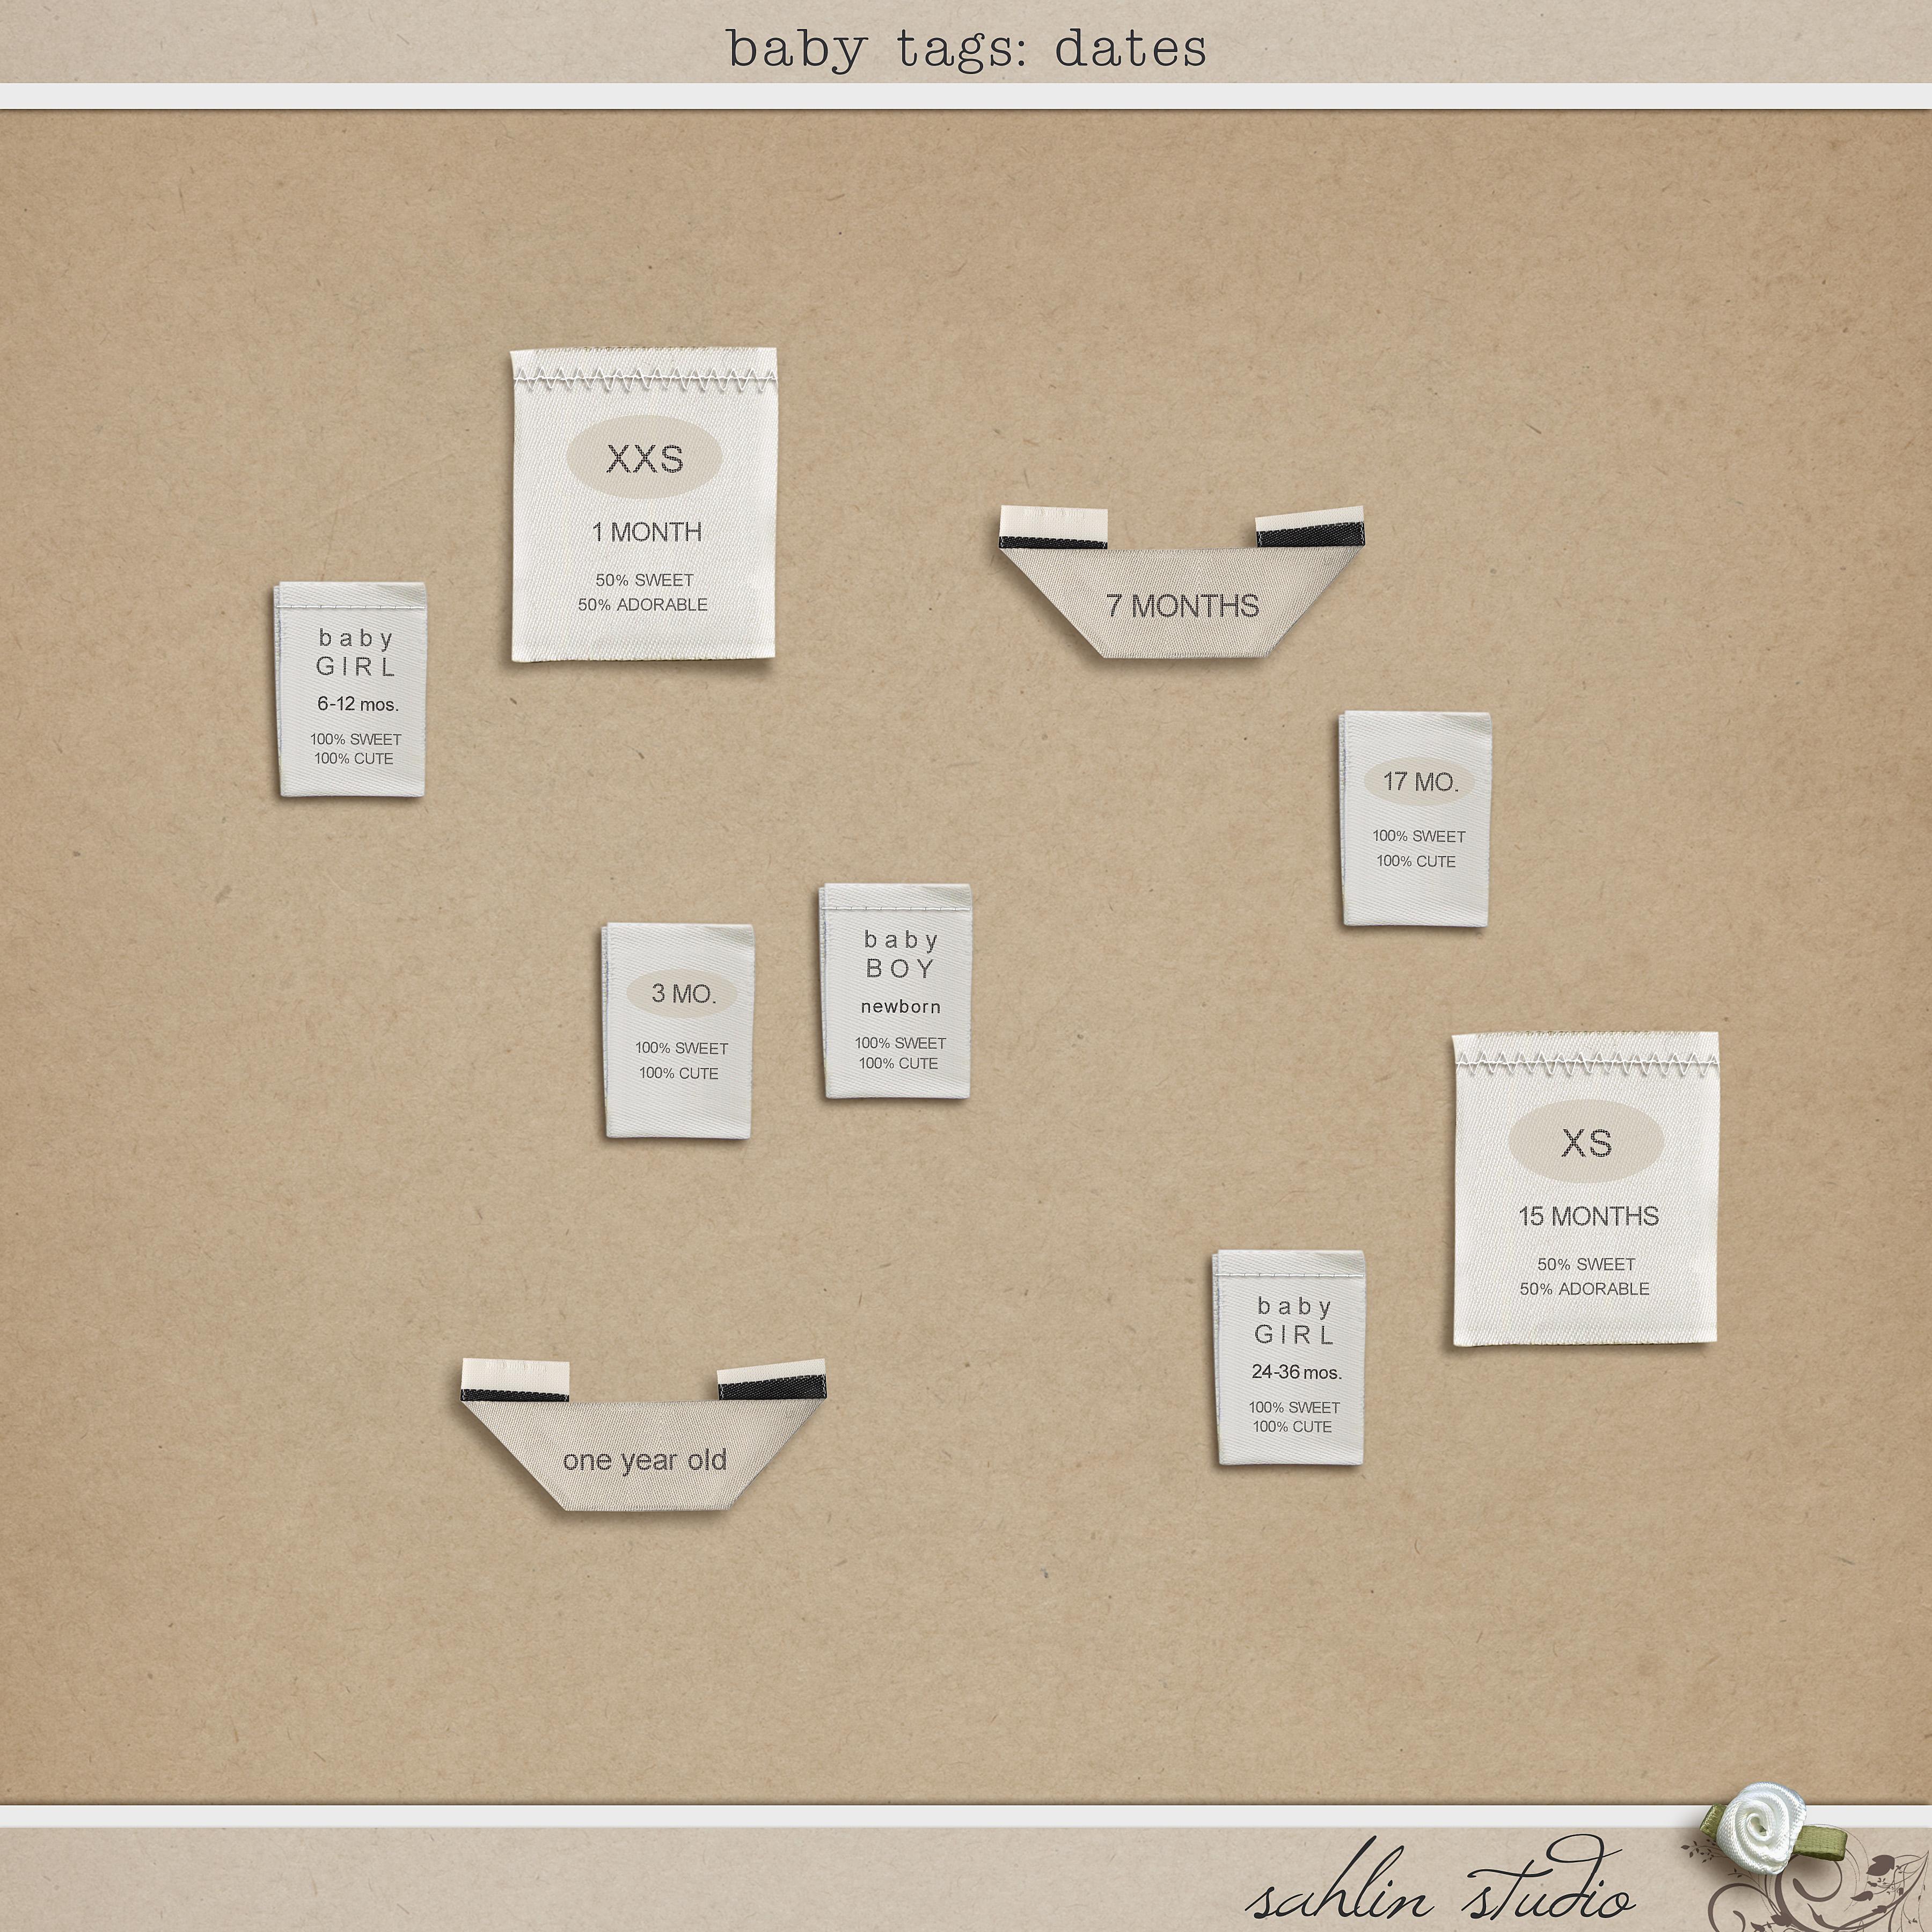 Baby Tag Dates by Sahlin Studio